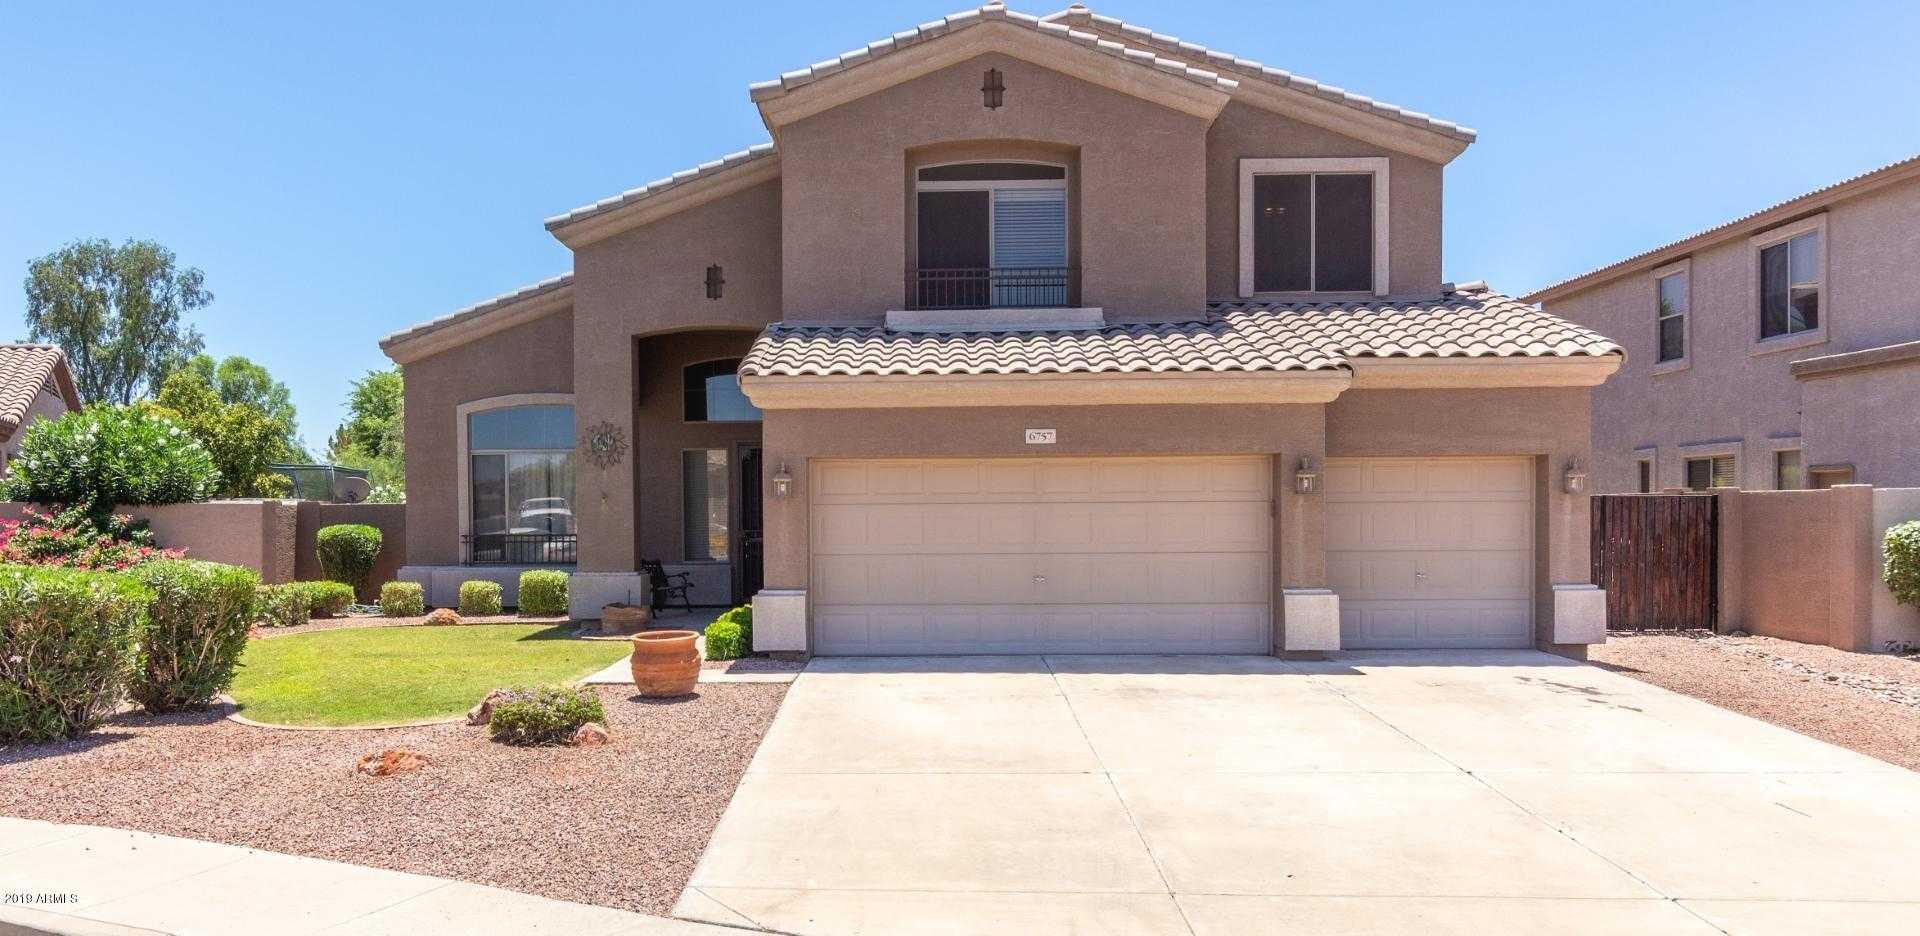 $409,000 - 5Br/3Ba - Home for Sale in Sonoma, Glendale